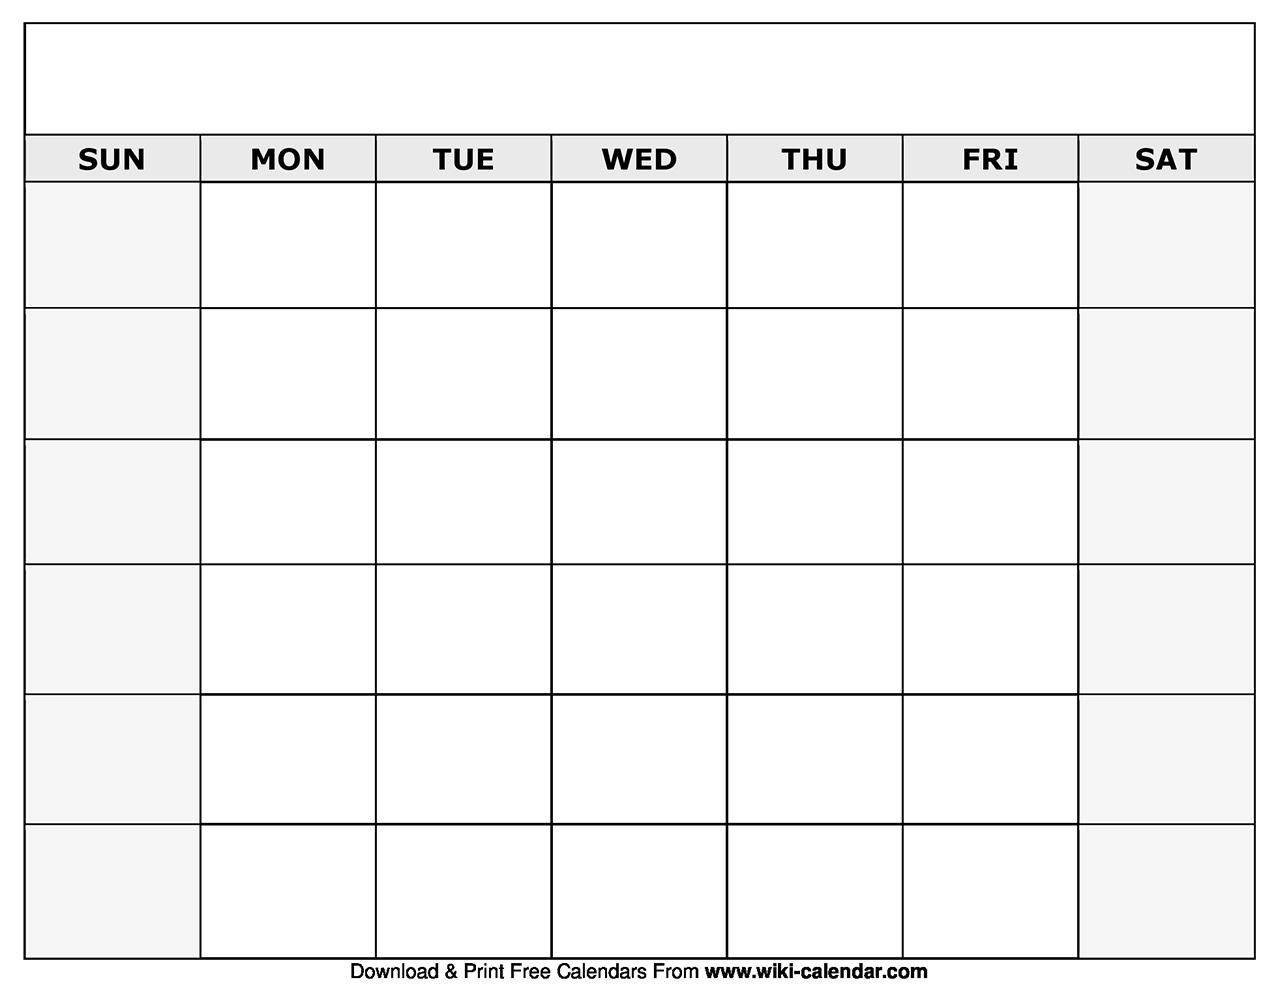 Printable Blank Calendar Templates pertaining to Blank Monthly Calendar Printable With Lines